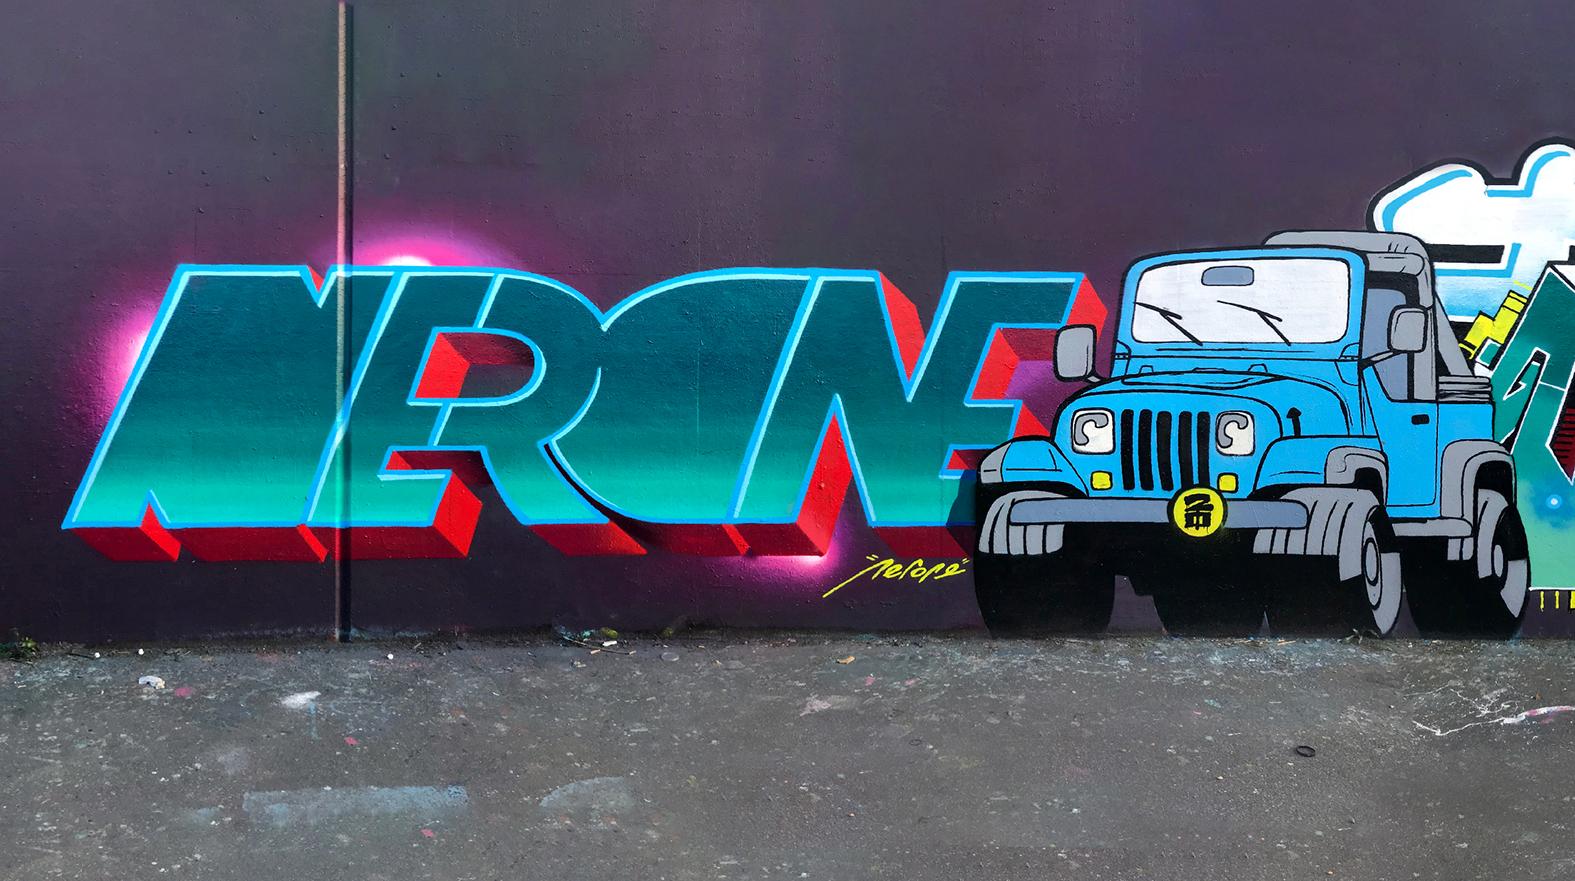 Nerone-Urocki-London-3